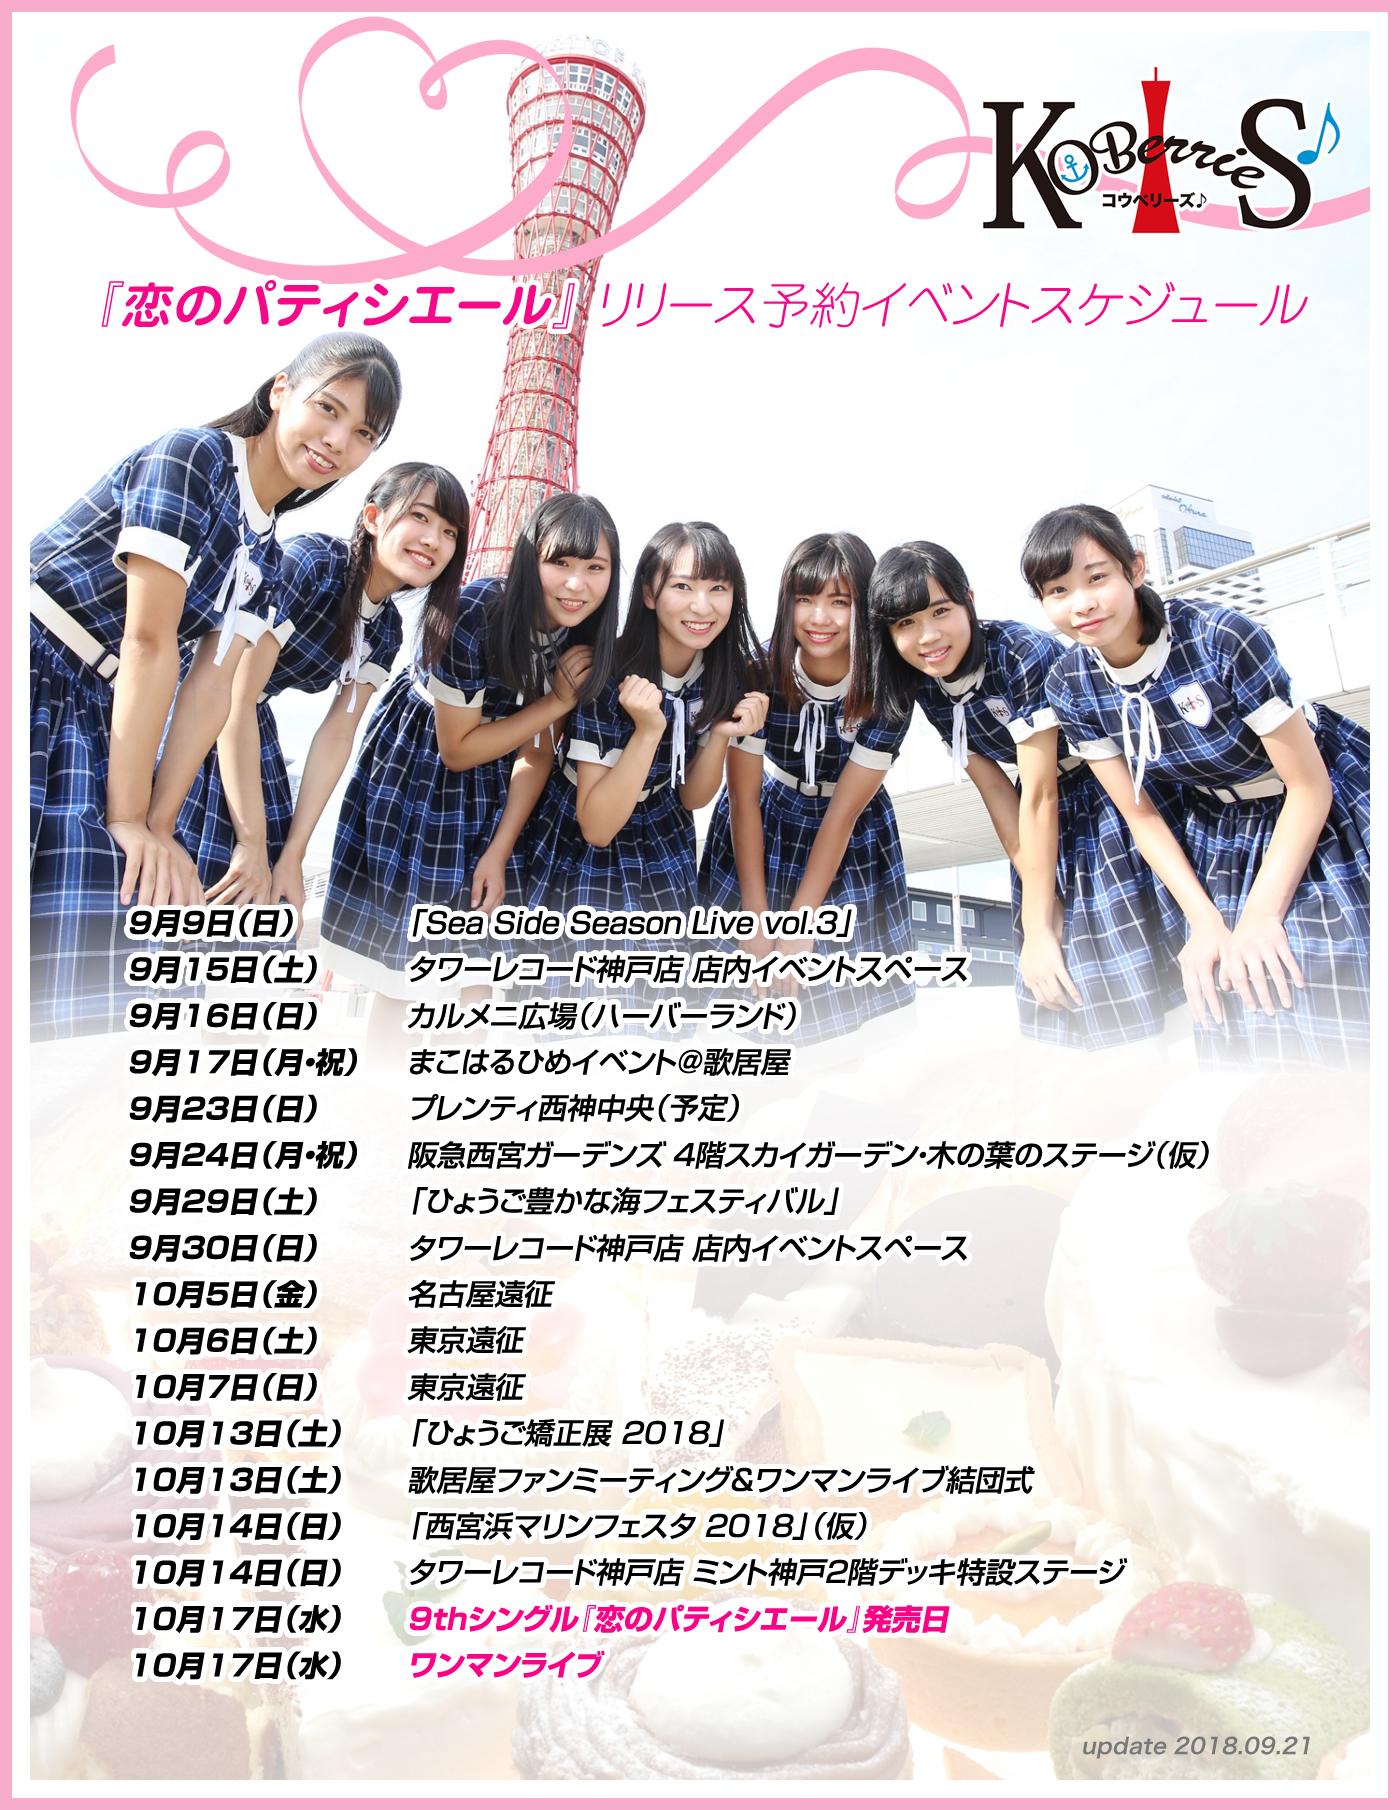 10.24 ON SALE『恋のパティシエール』リリース予約イベント開催中!